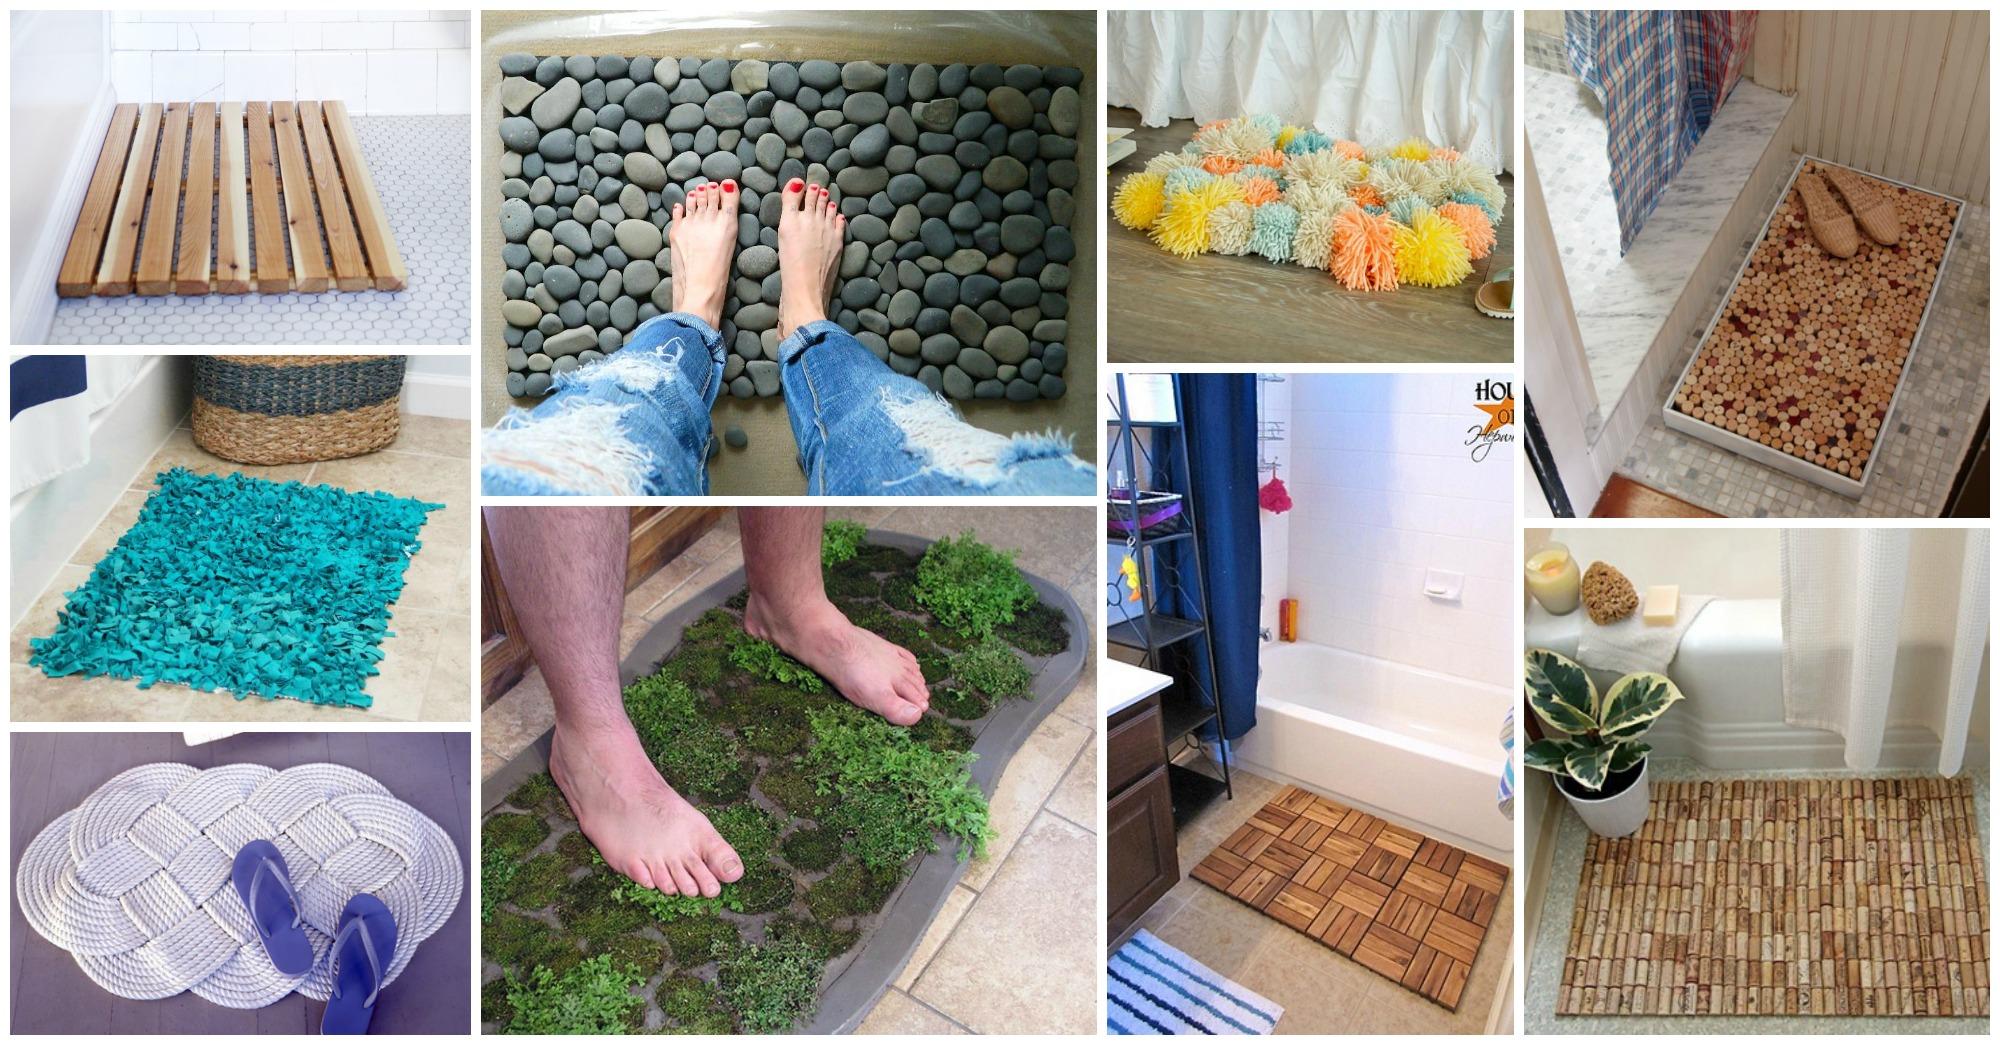 shower uk b home best kitchen amazon mats sellers floor mat co